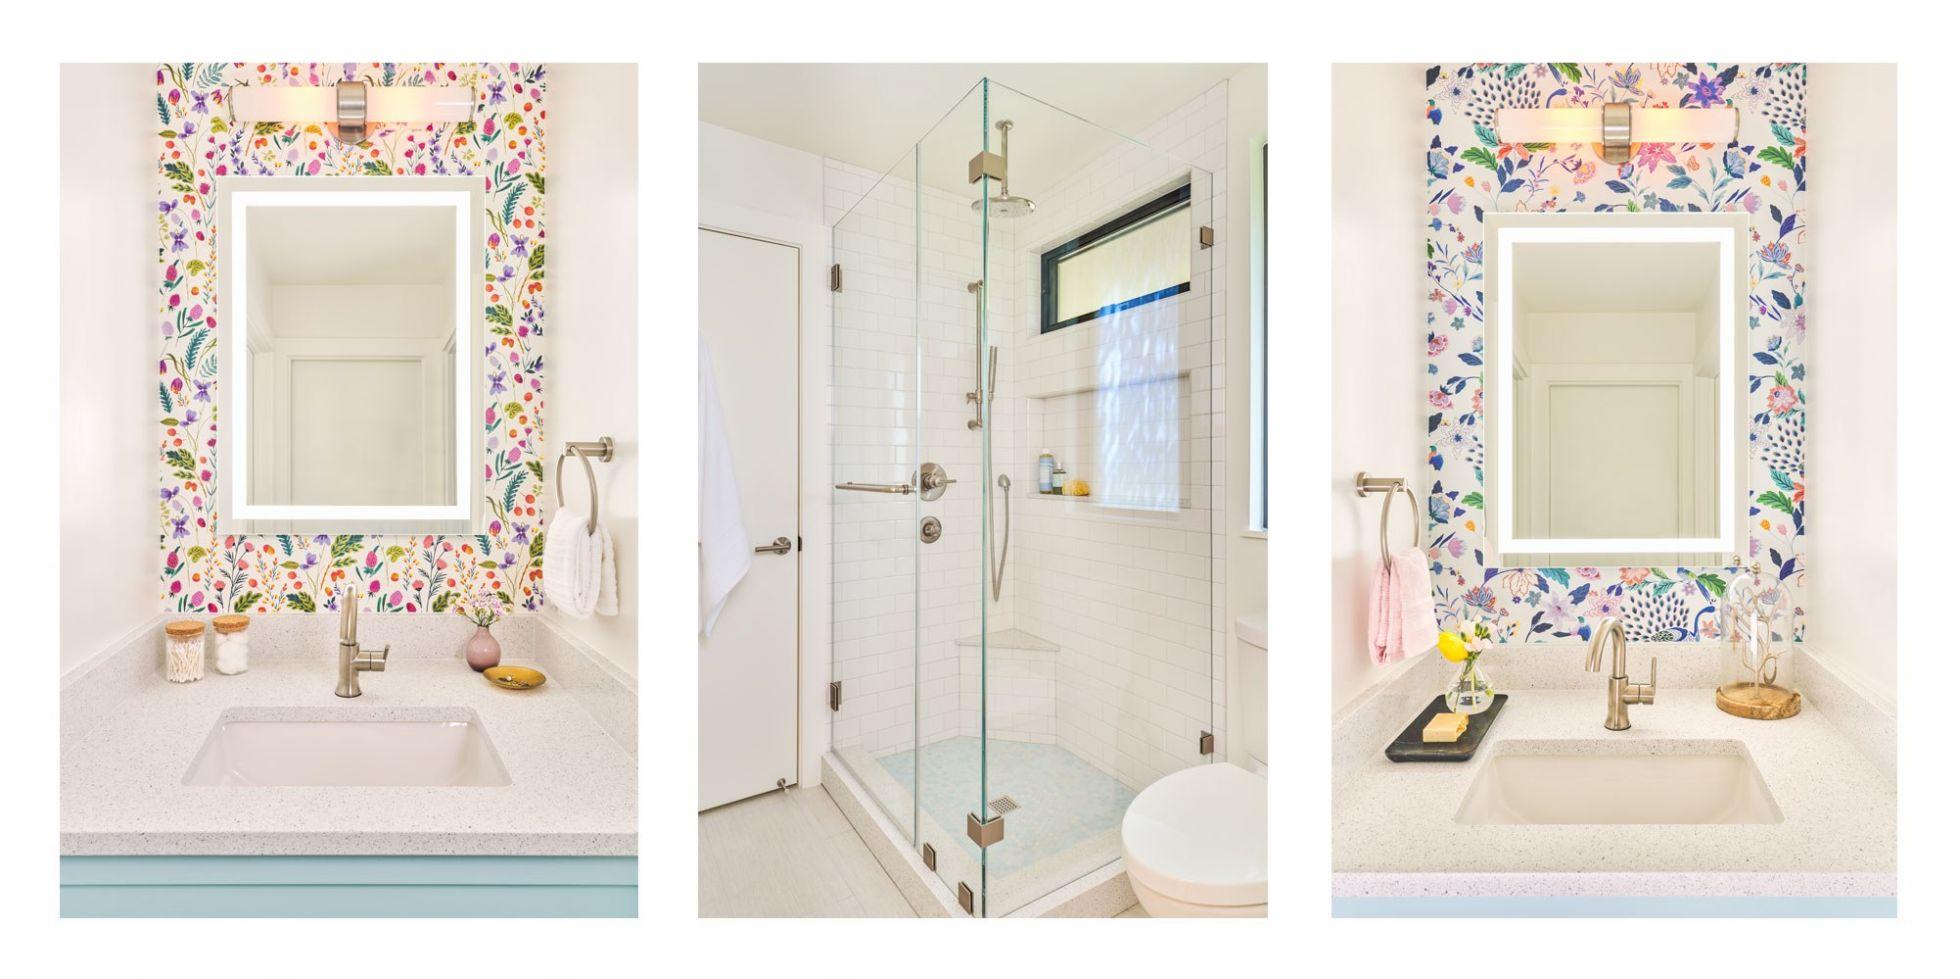 Bath composite